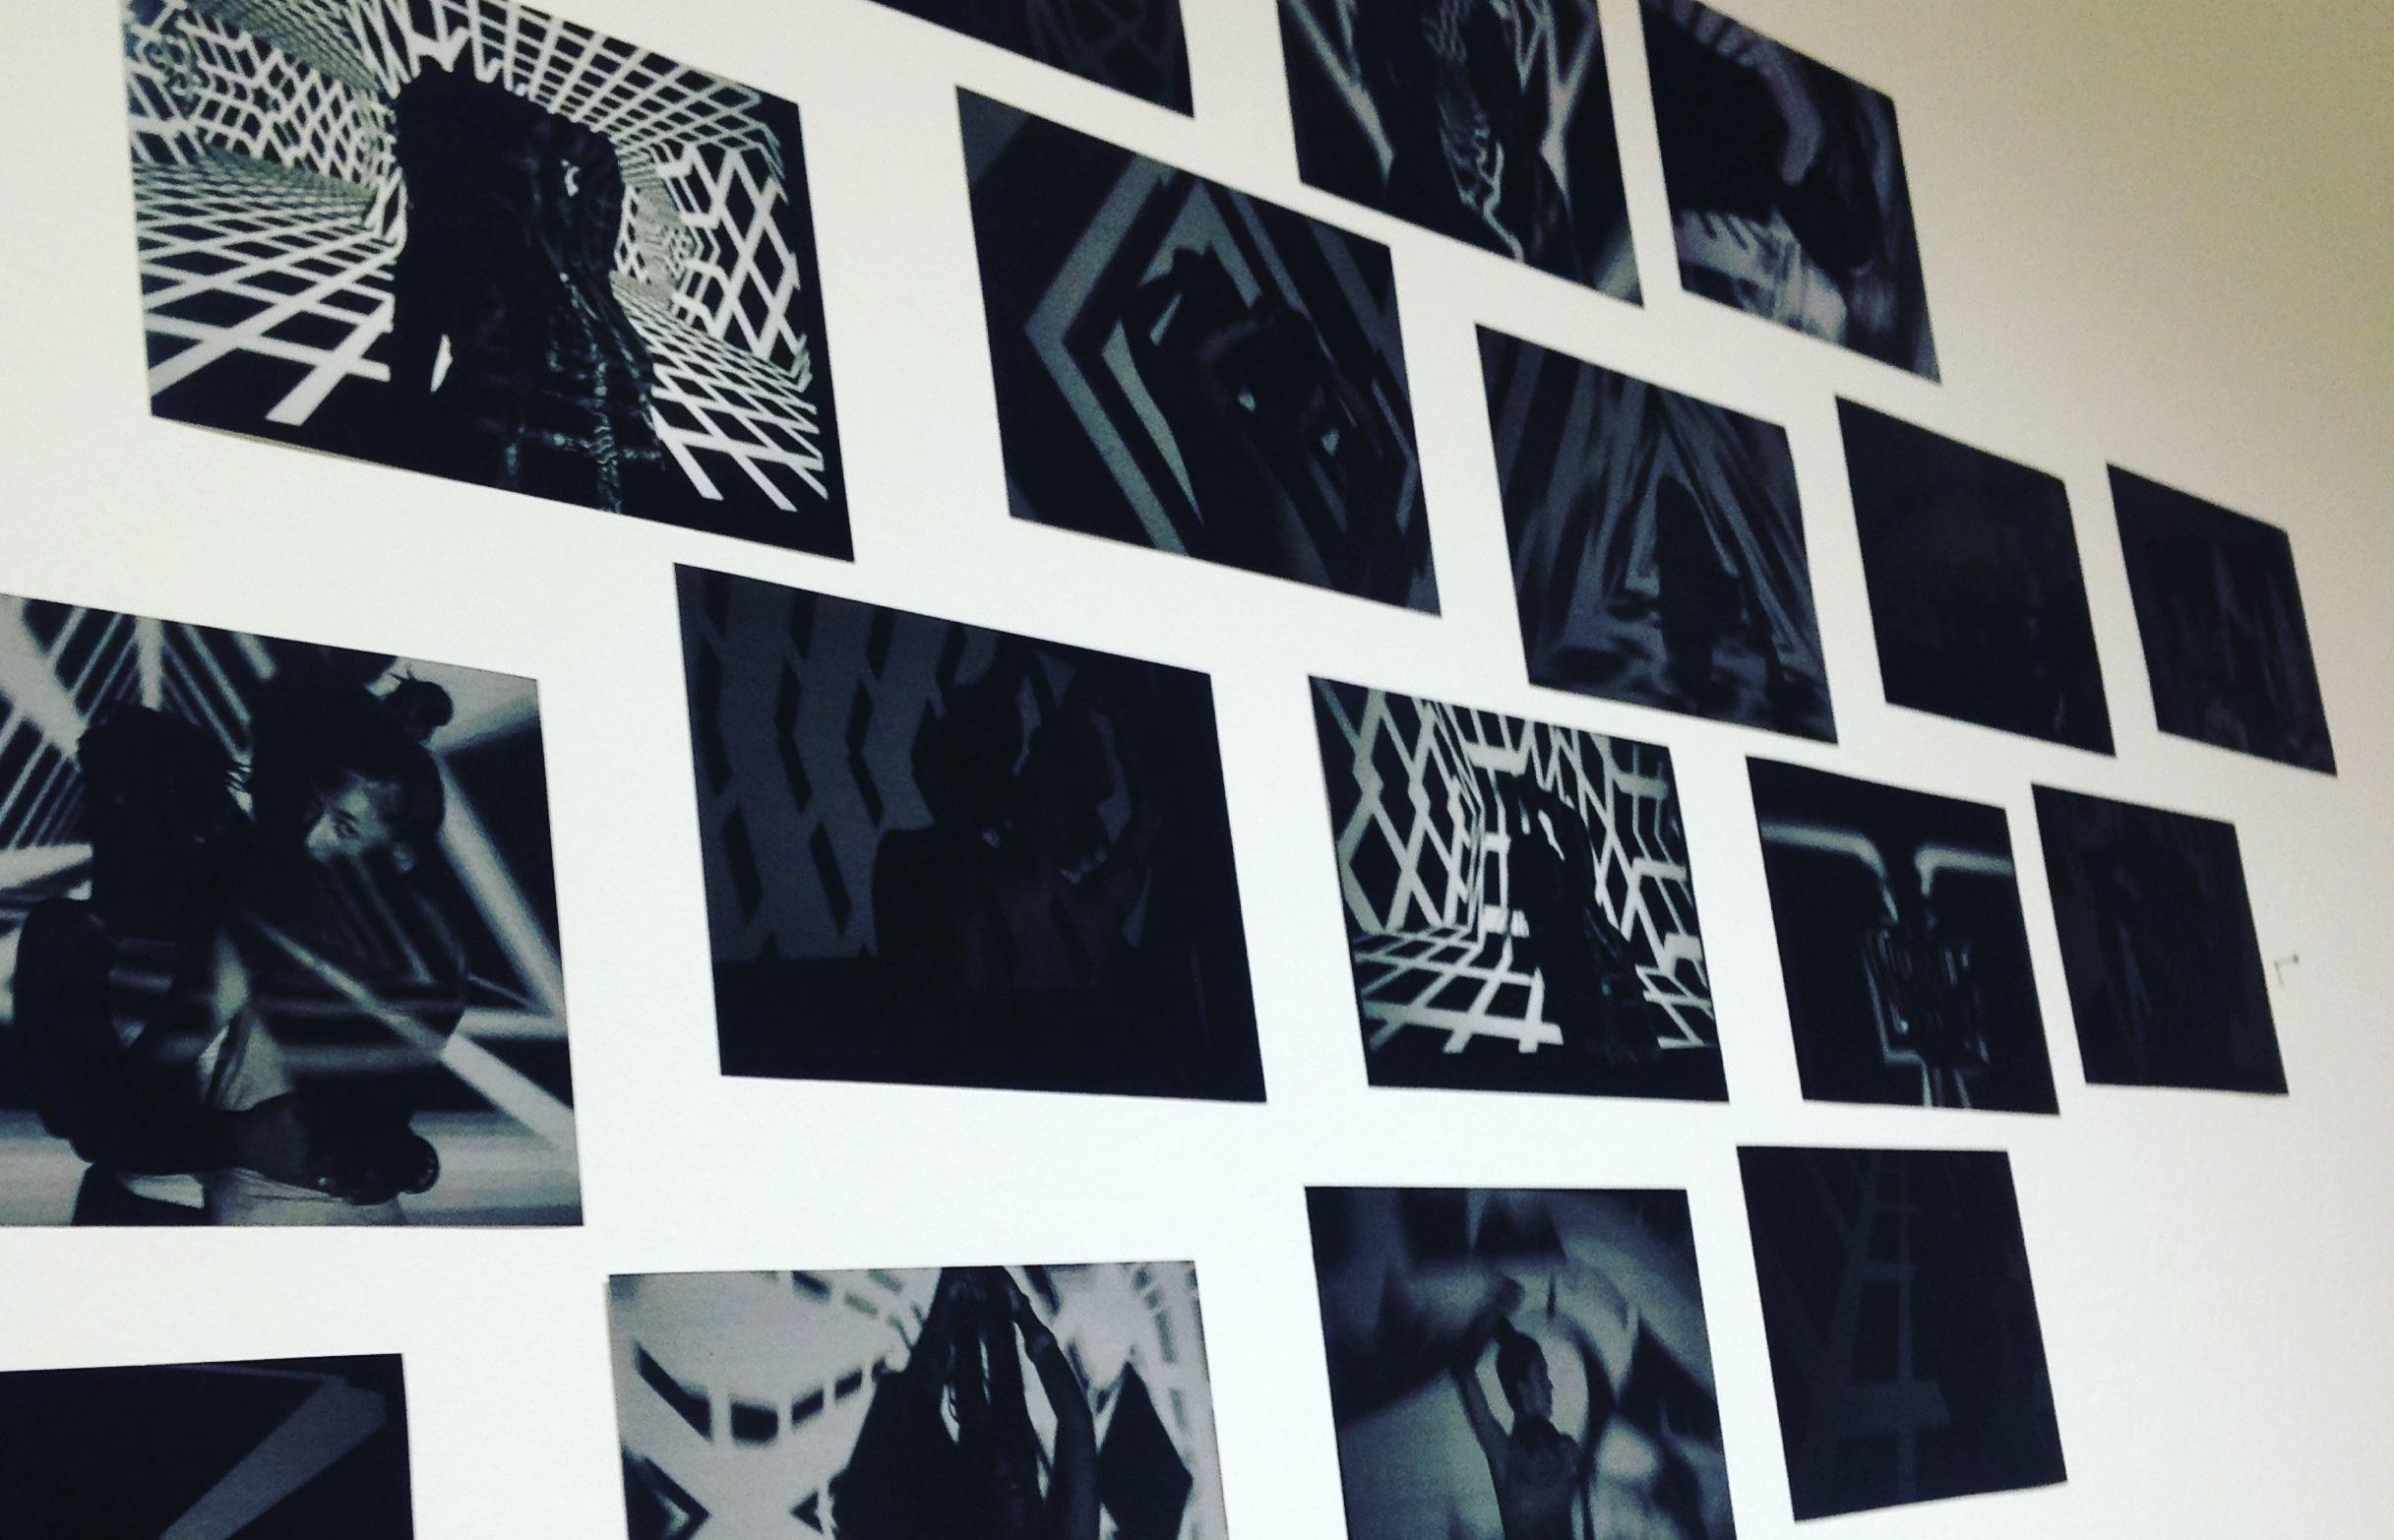 The Cube Project Έκθεση φωτογραφίας